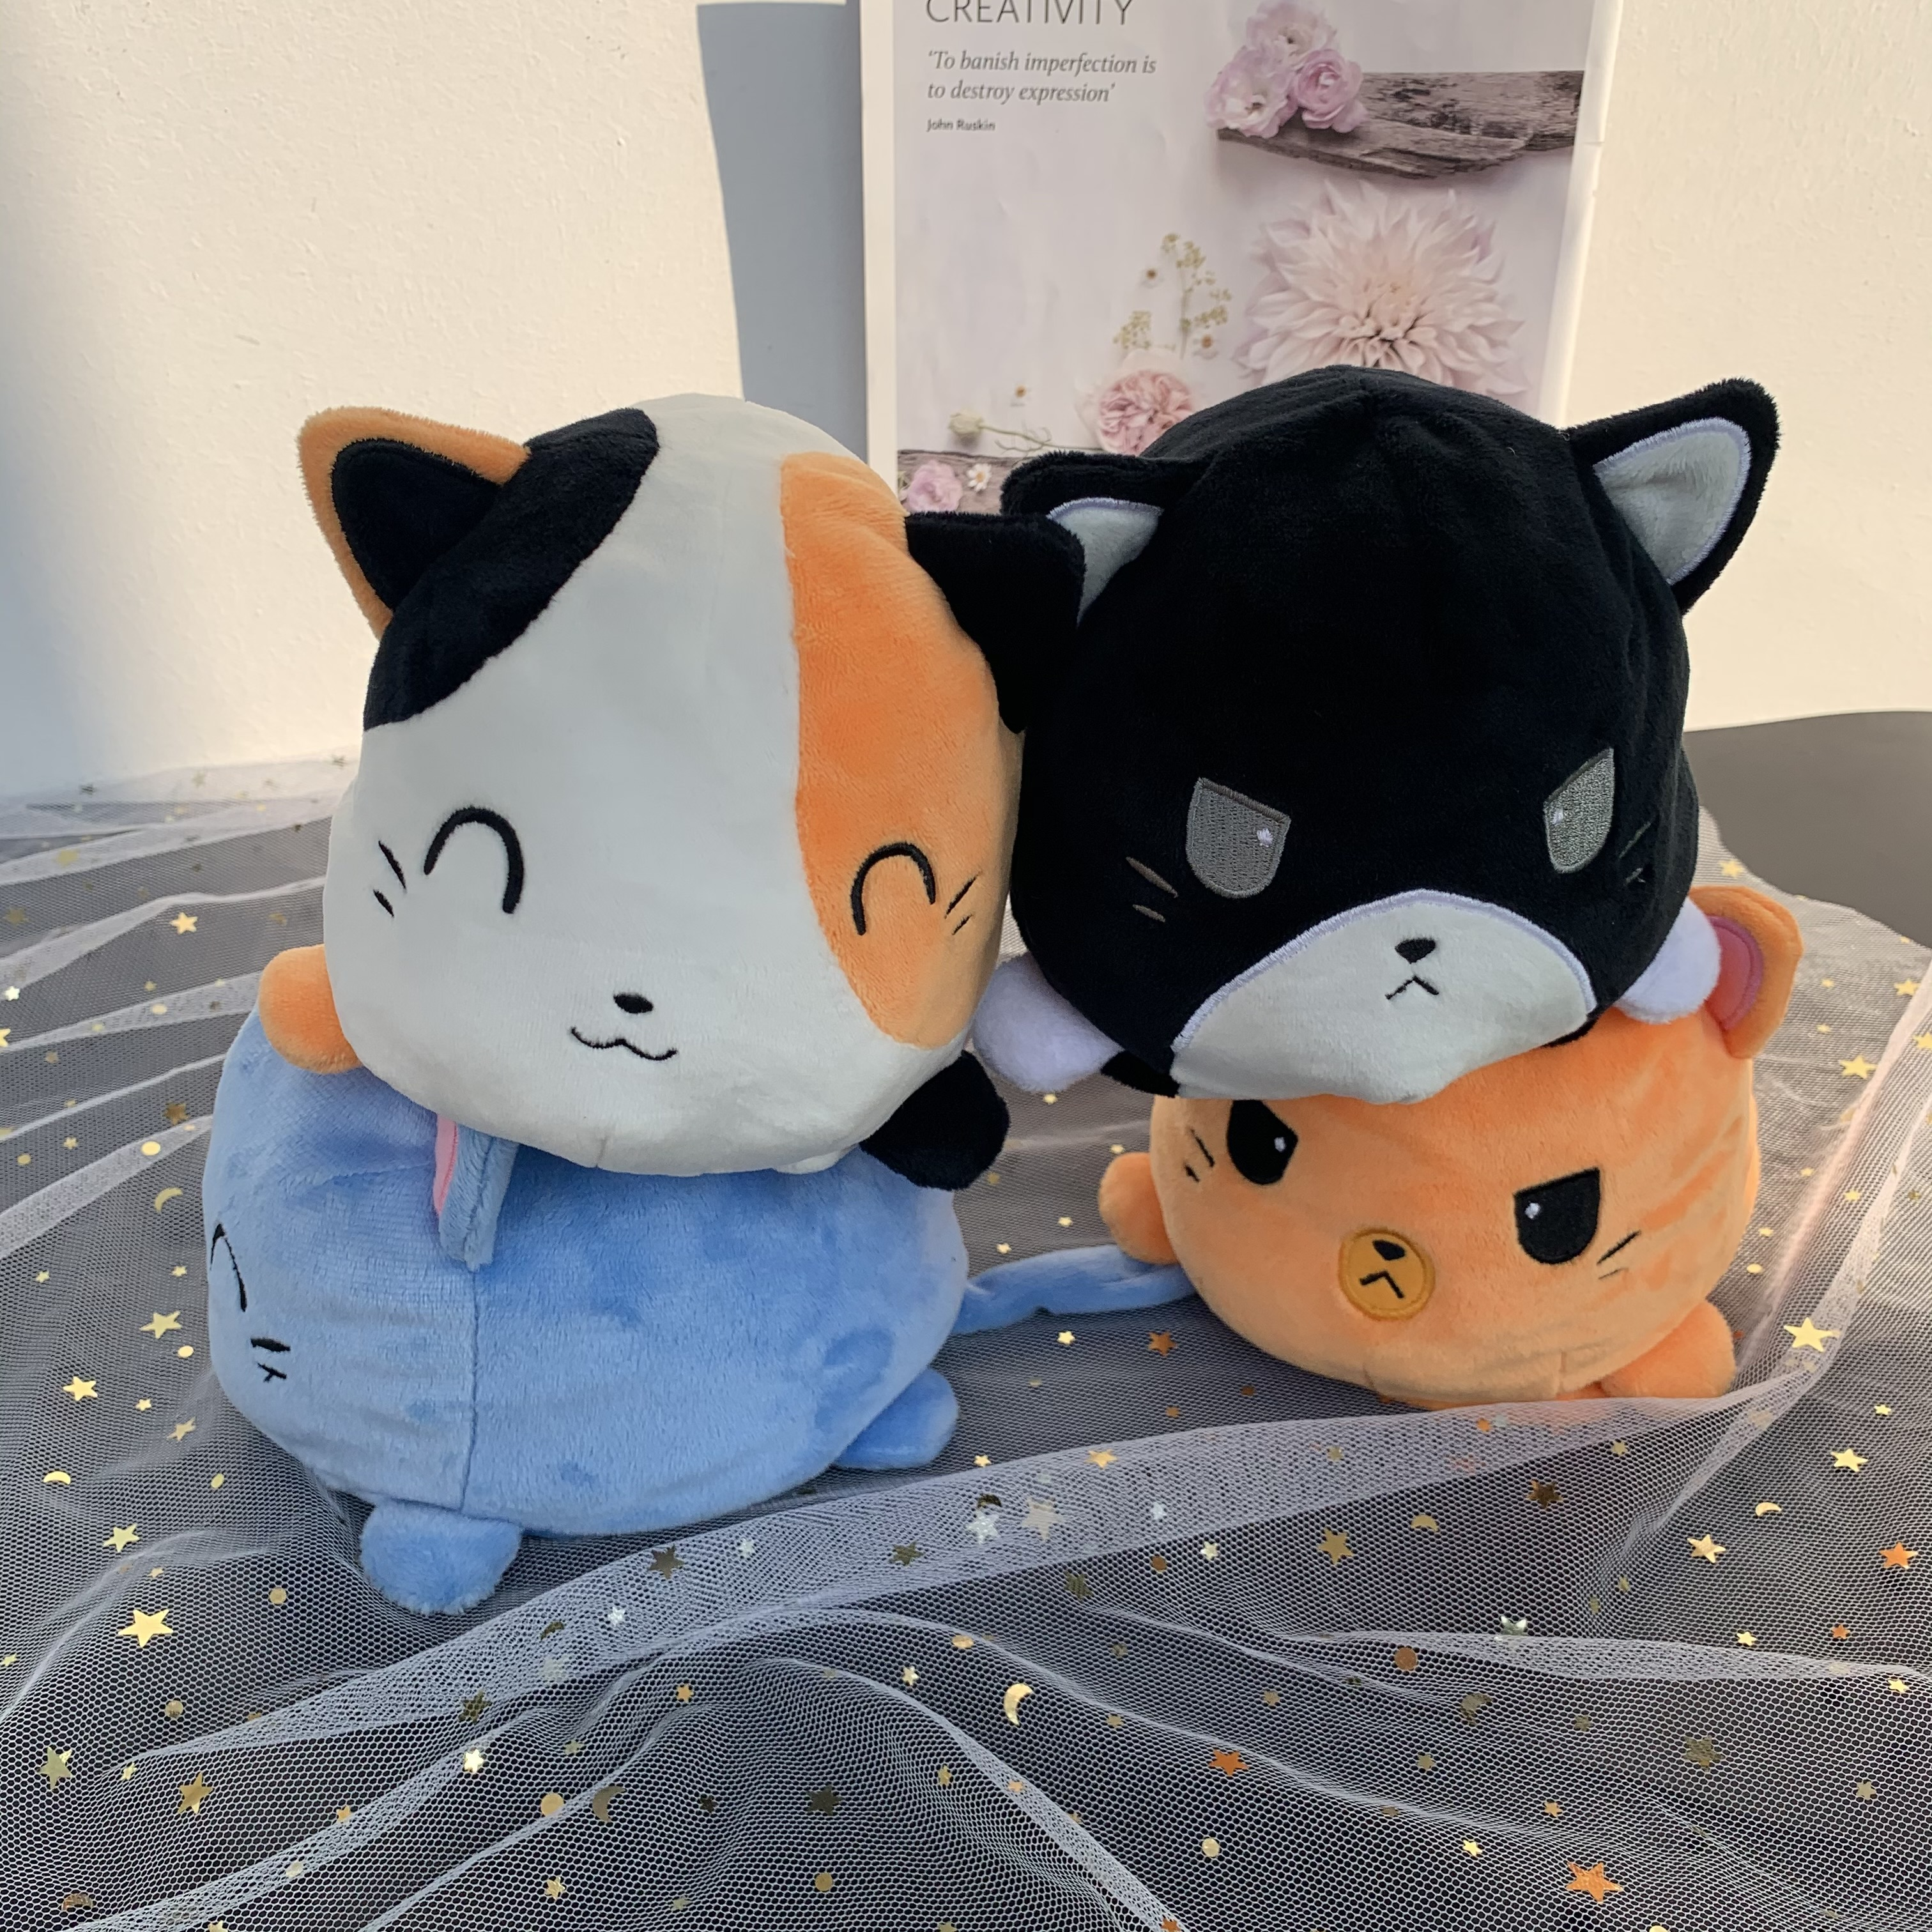 Reversible cat Gato Peluche Pulpo Reversible Pulpito Reversible Flip Octopu Toys Plush Toy Children Kids Birthday Gift Toy